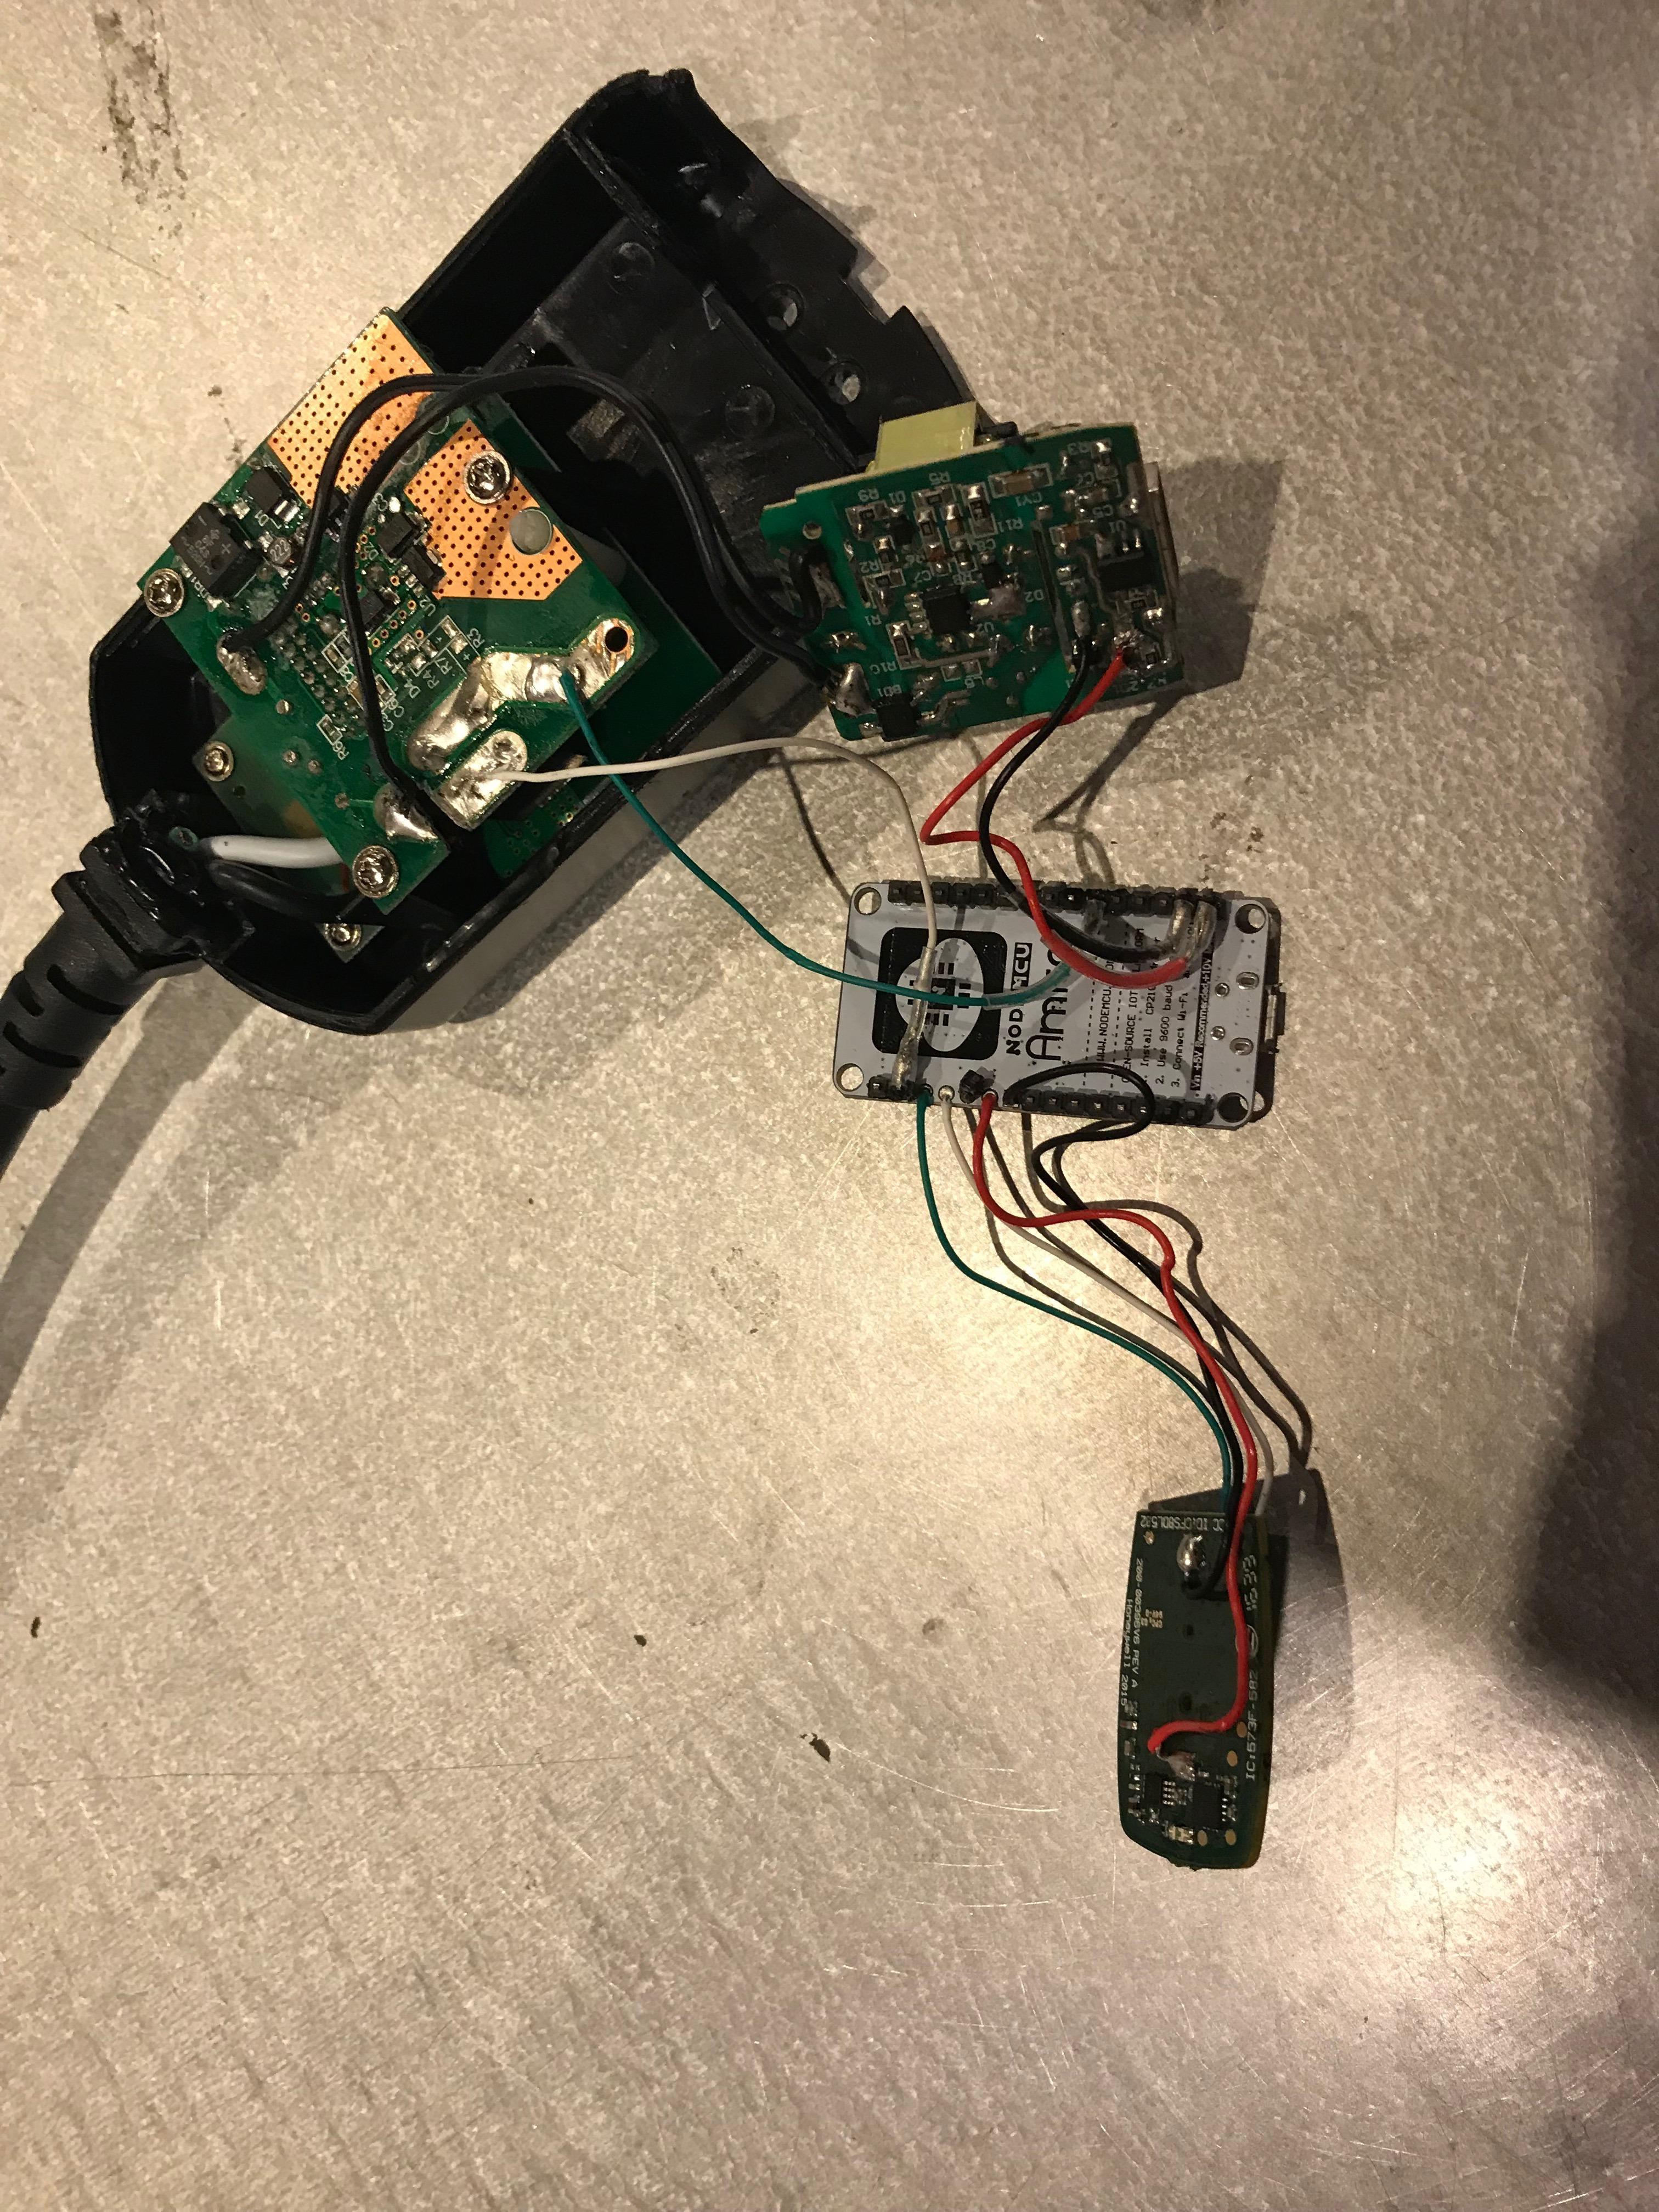 Picture of Powering the Arduino/Honeywell Keyfob